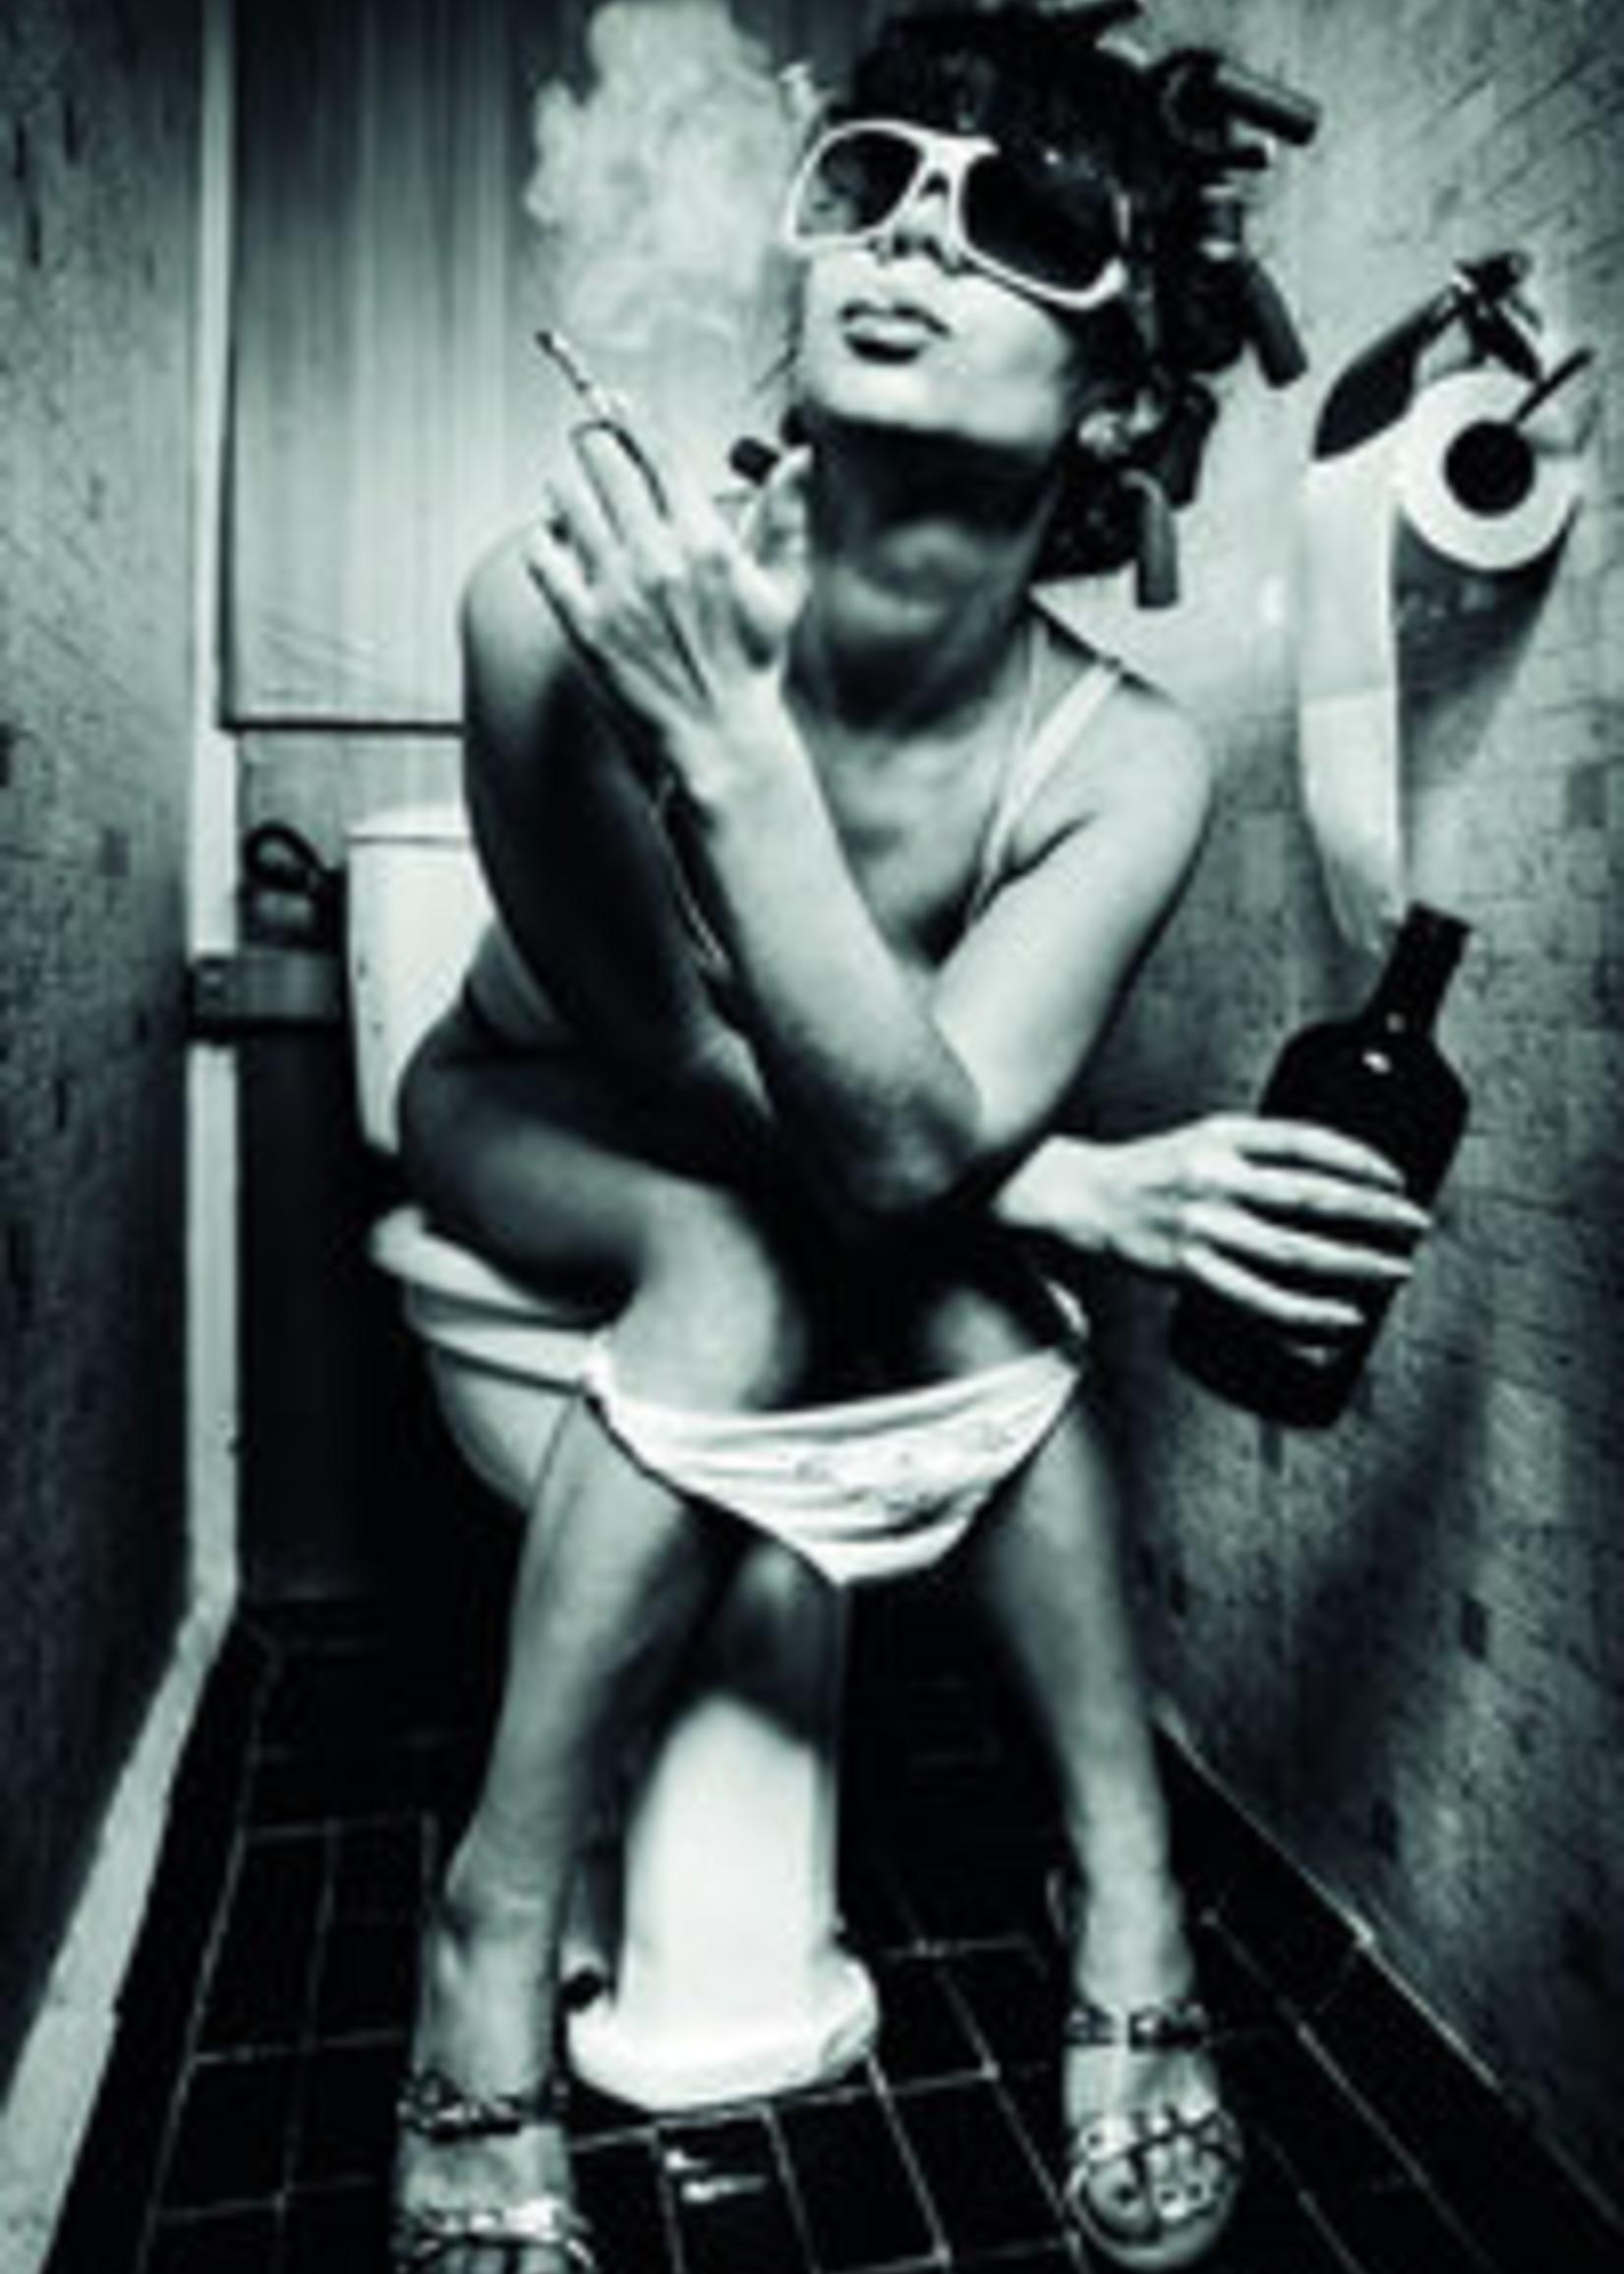 MondiArt Girl on the toilet with cigarette 60/80